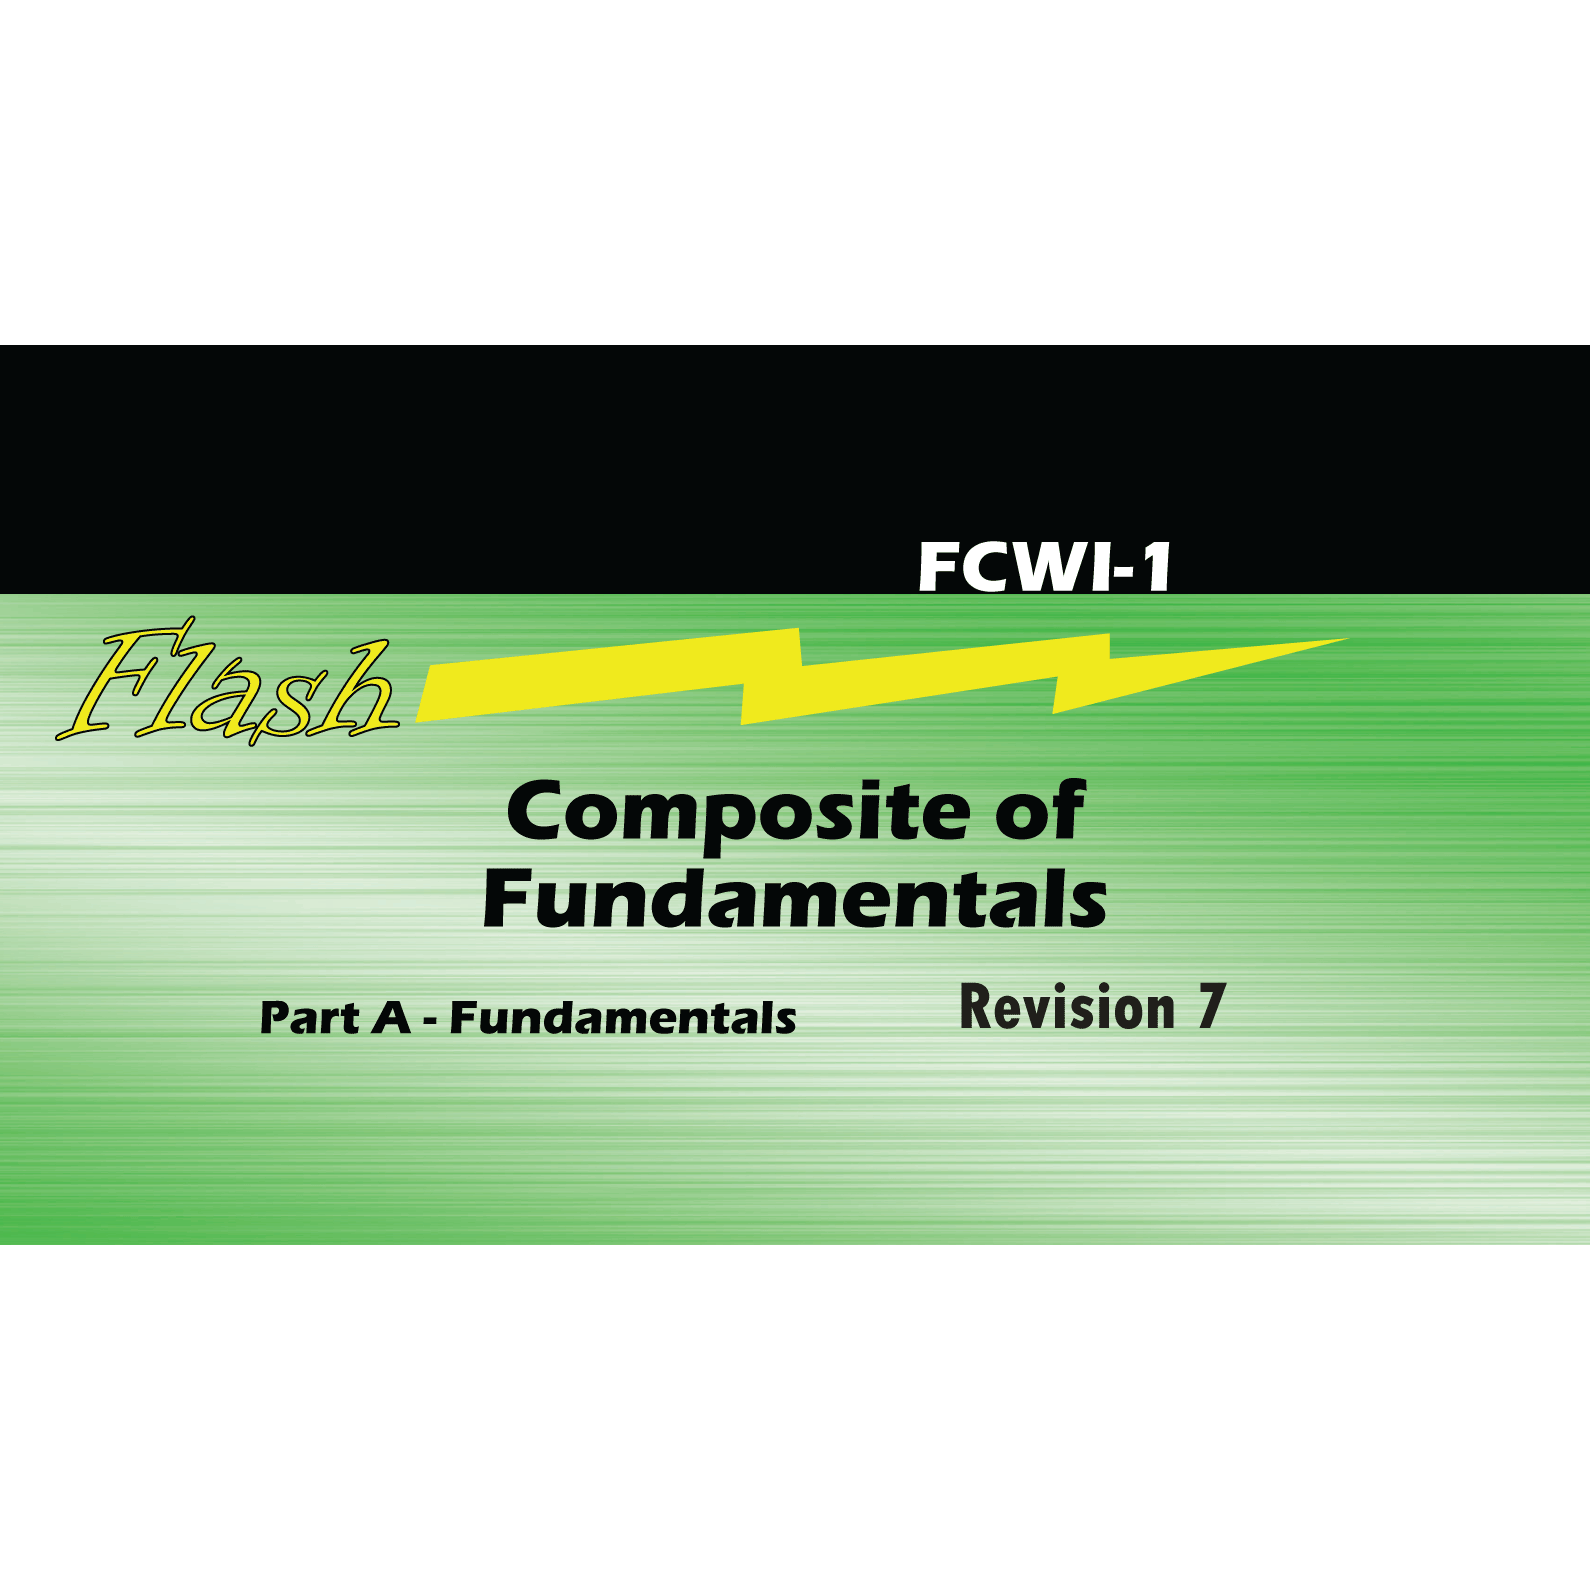 Composite of Fundamentals flashcards for CWI Exam